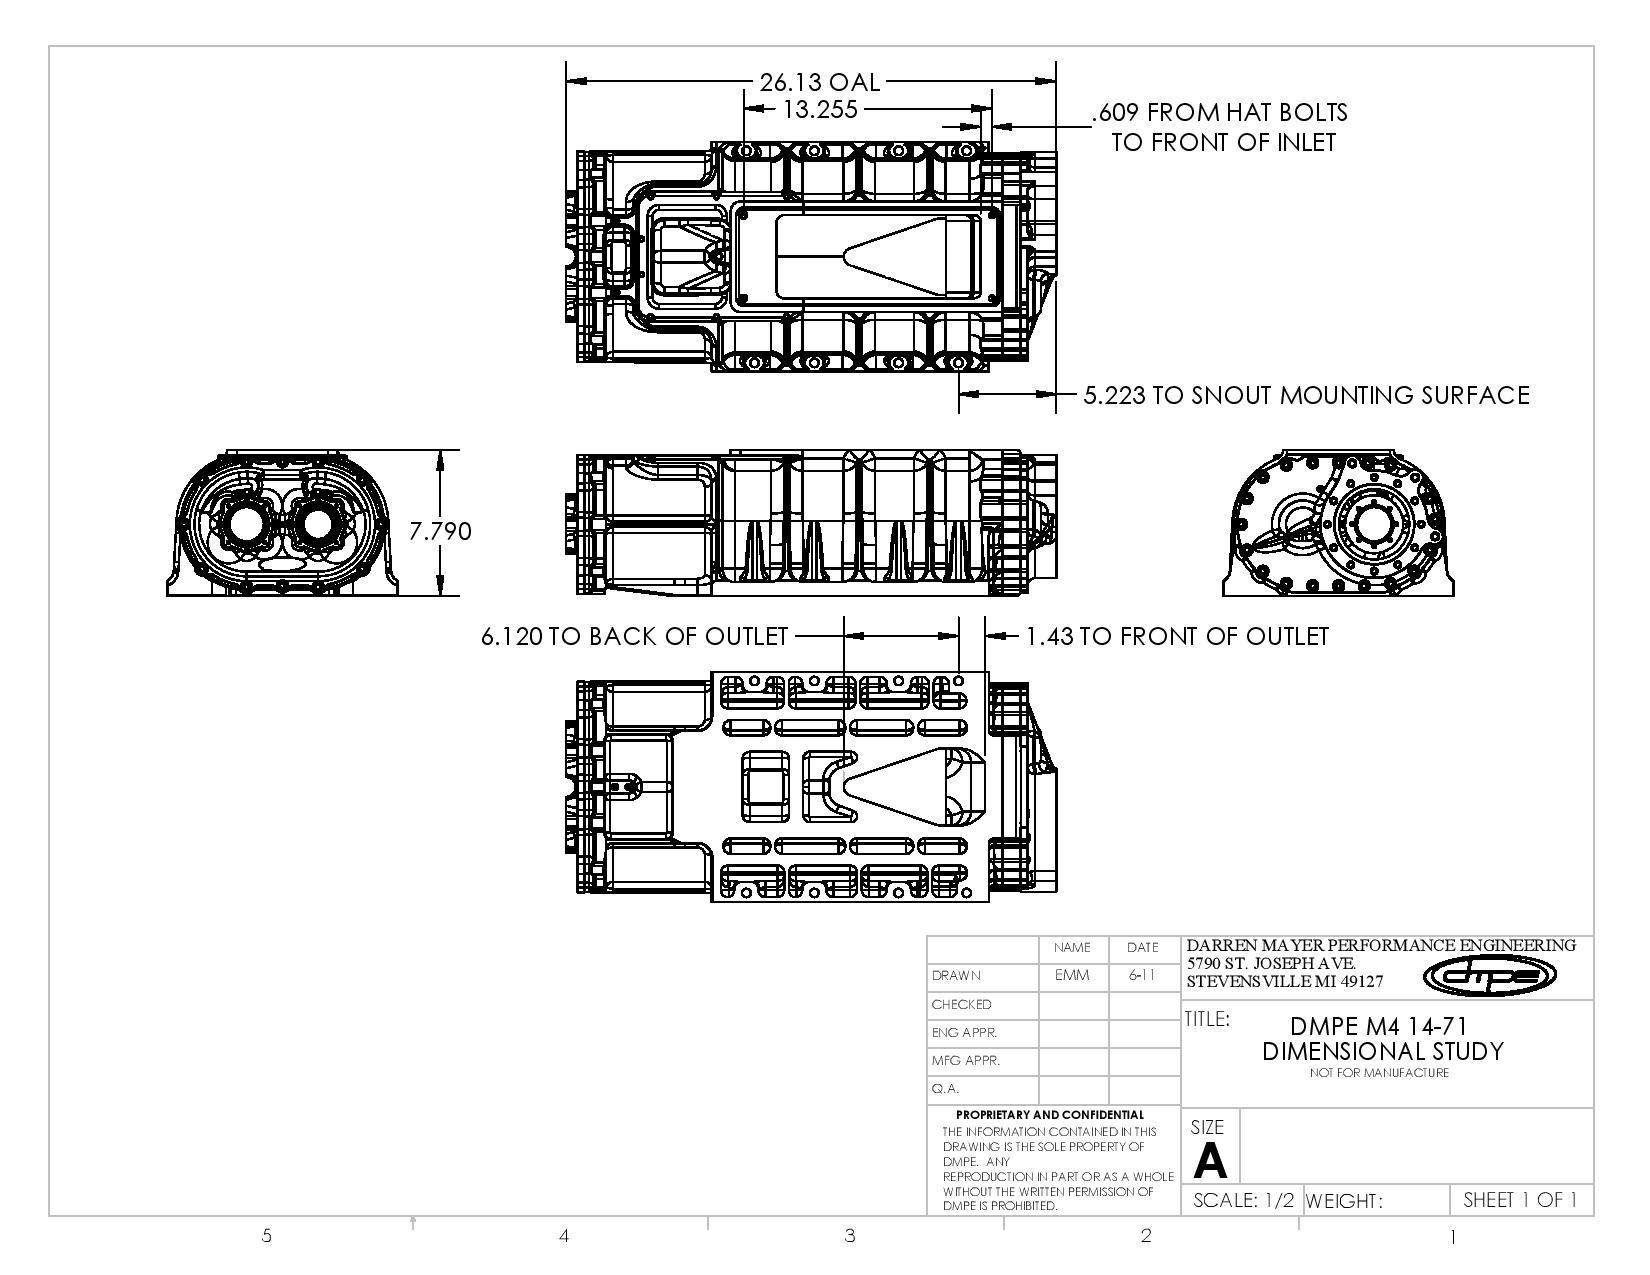 m4-14-71-basic-dimensional-info-page-001.jpg